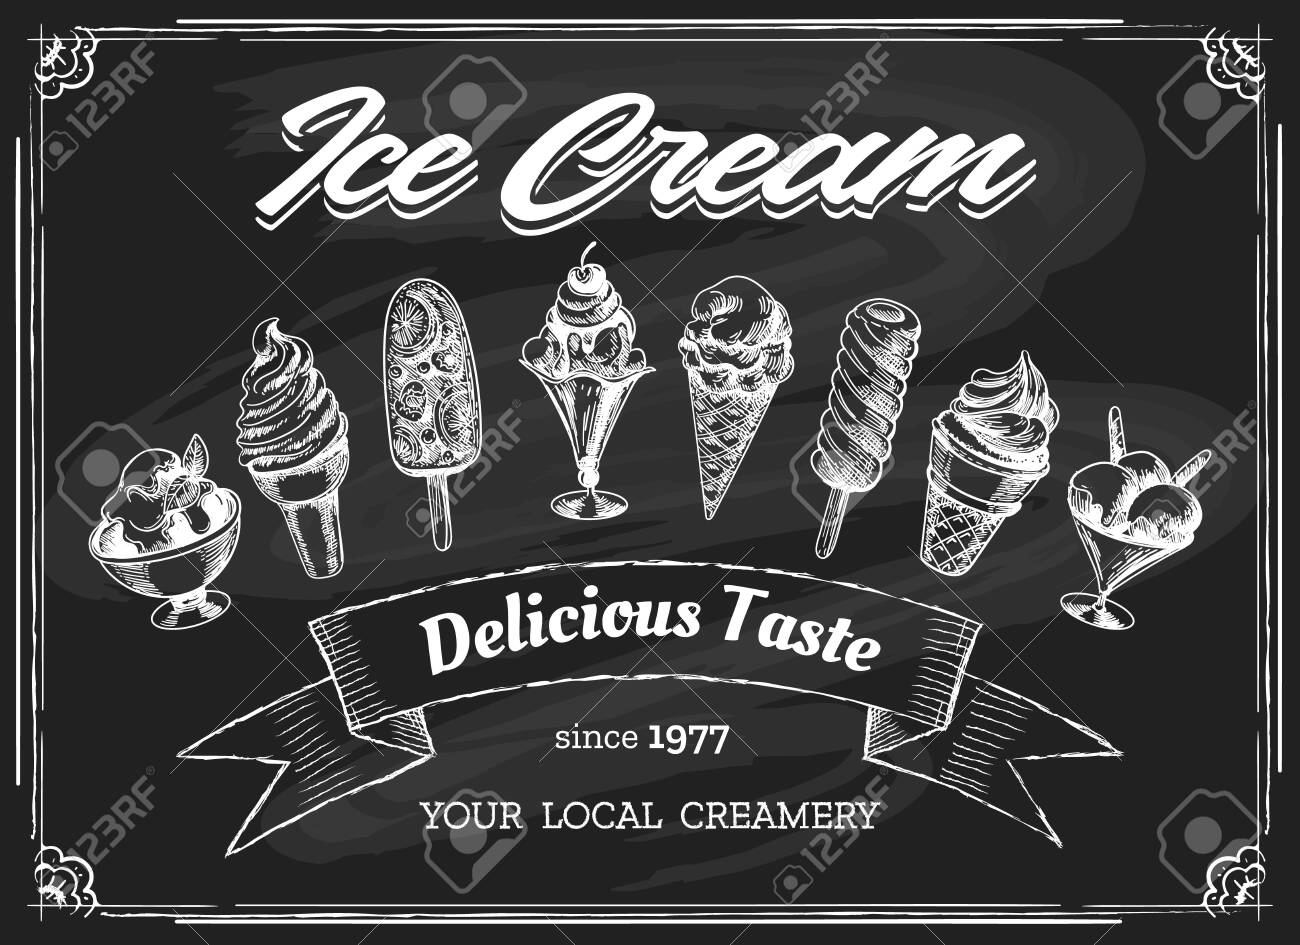 Ice cream chalk board drawing. Eskimo cream sketch on chalkboard background, icecream shop or restaurant dessert menu vector hand drawn illustration - 124559942